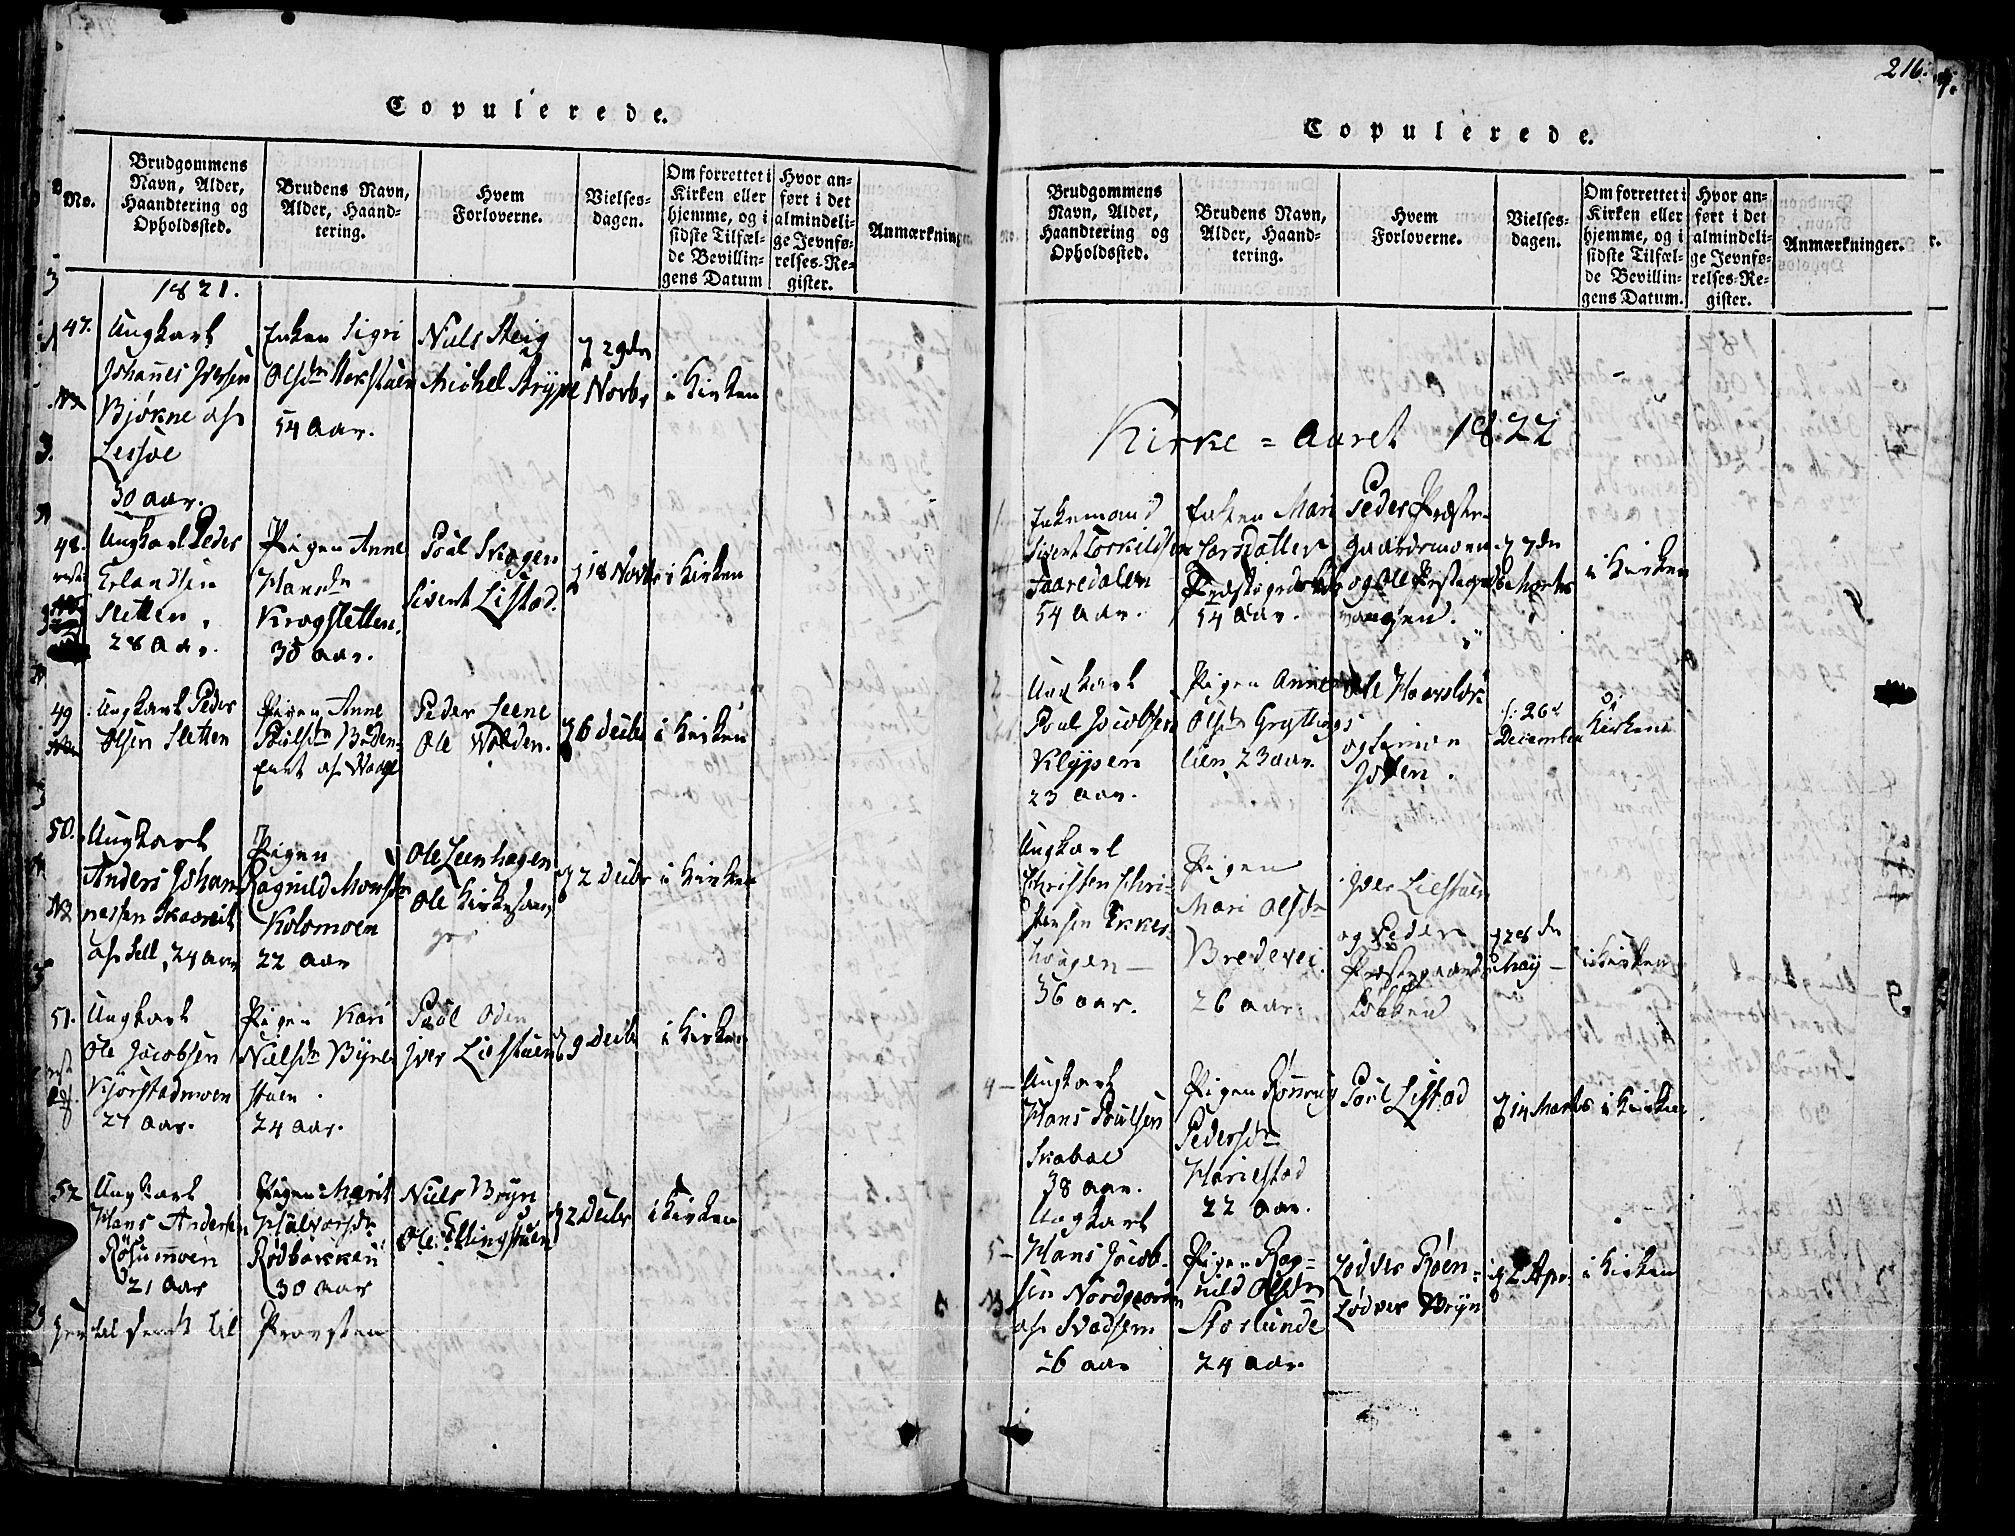 SAH, Fron prestekontor, H/Ha/Haa/L0002: Ministerialbok nr. 2, 1816-1827, s. 216